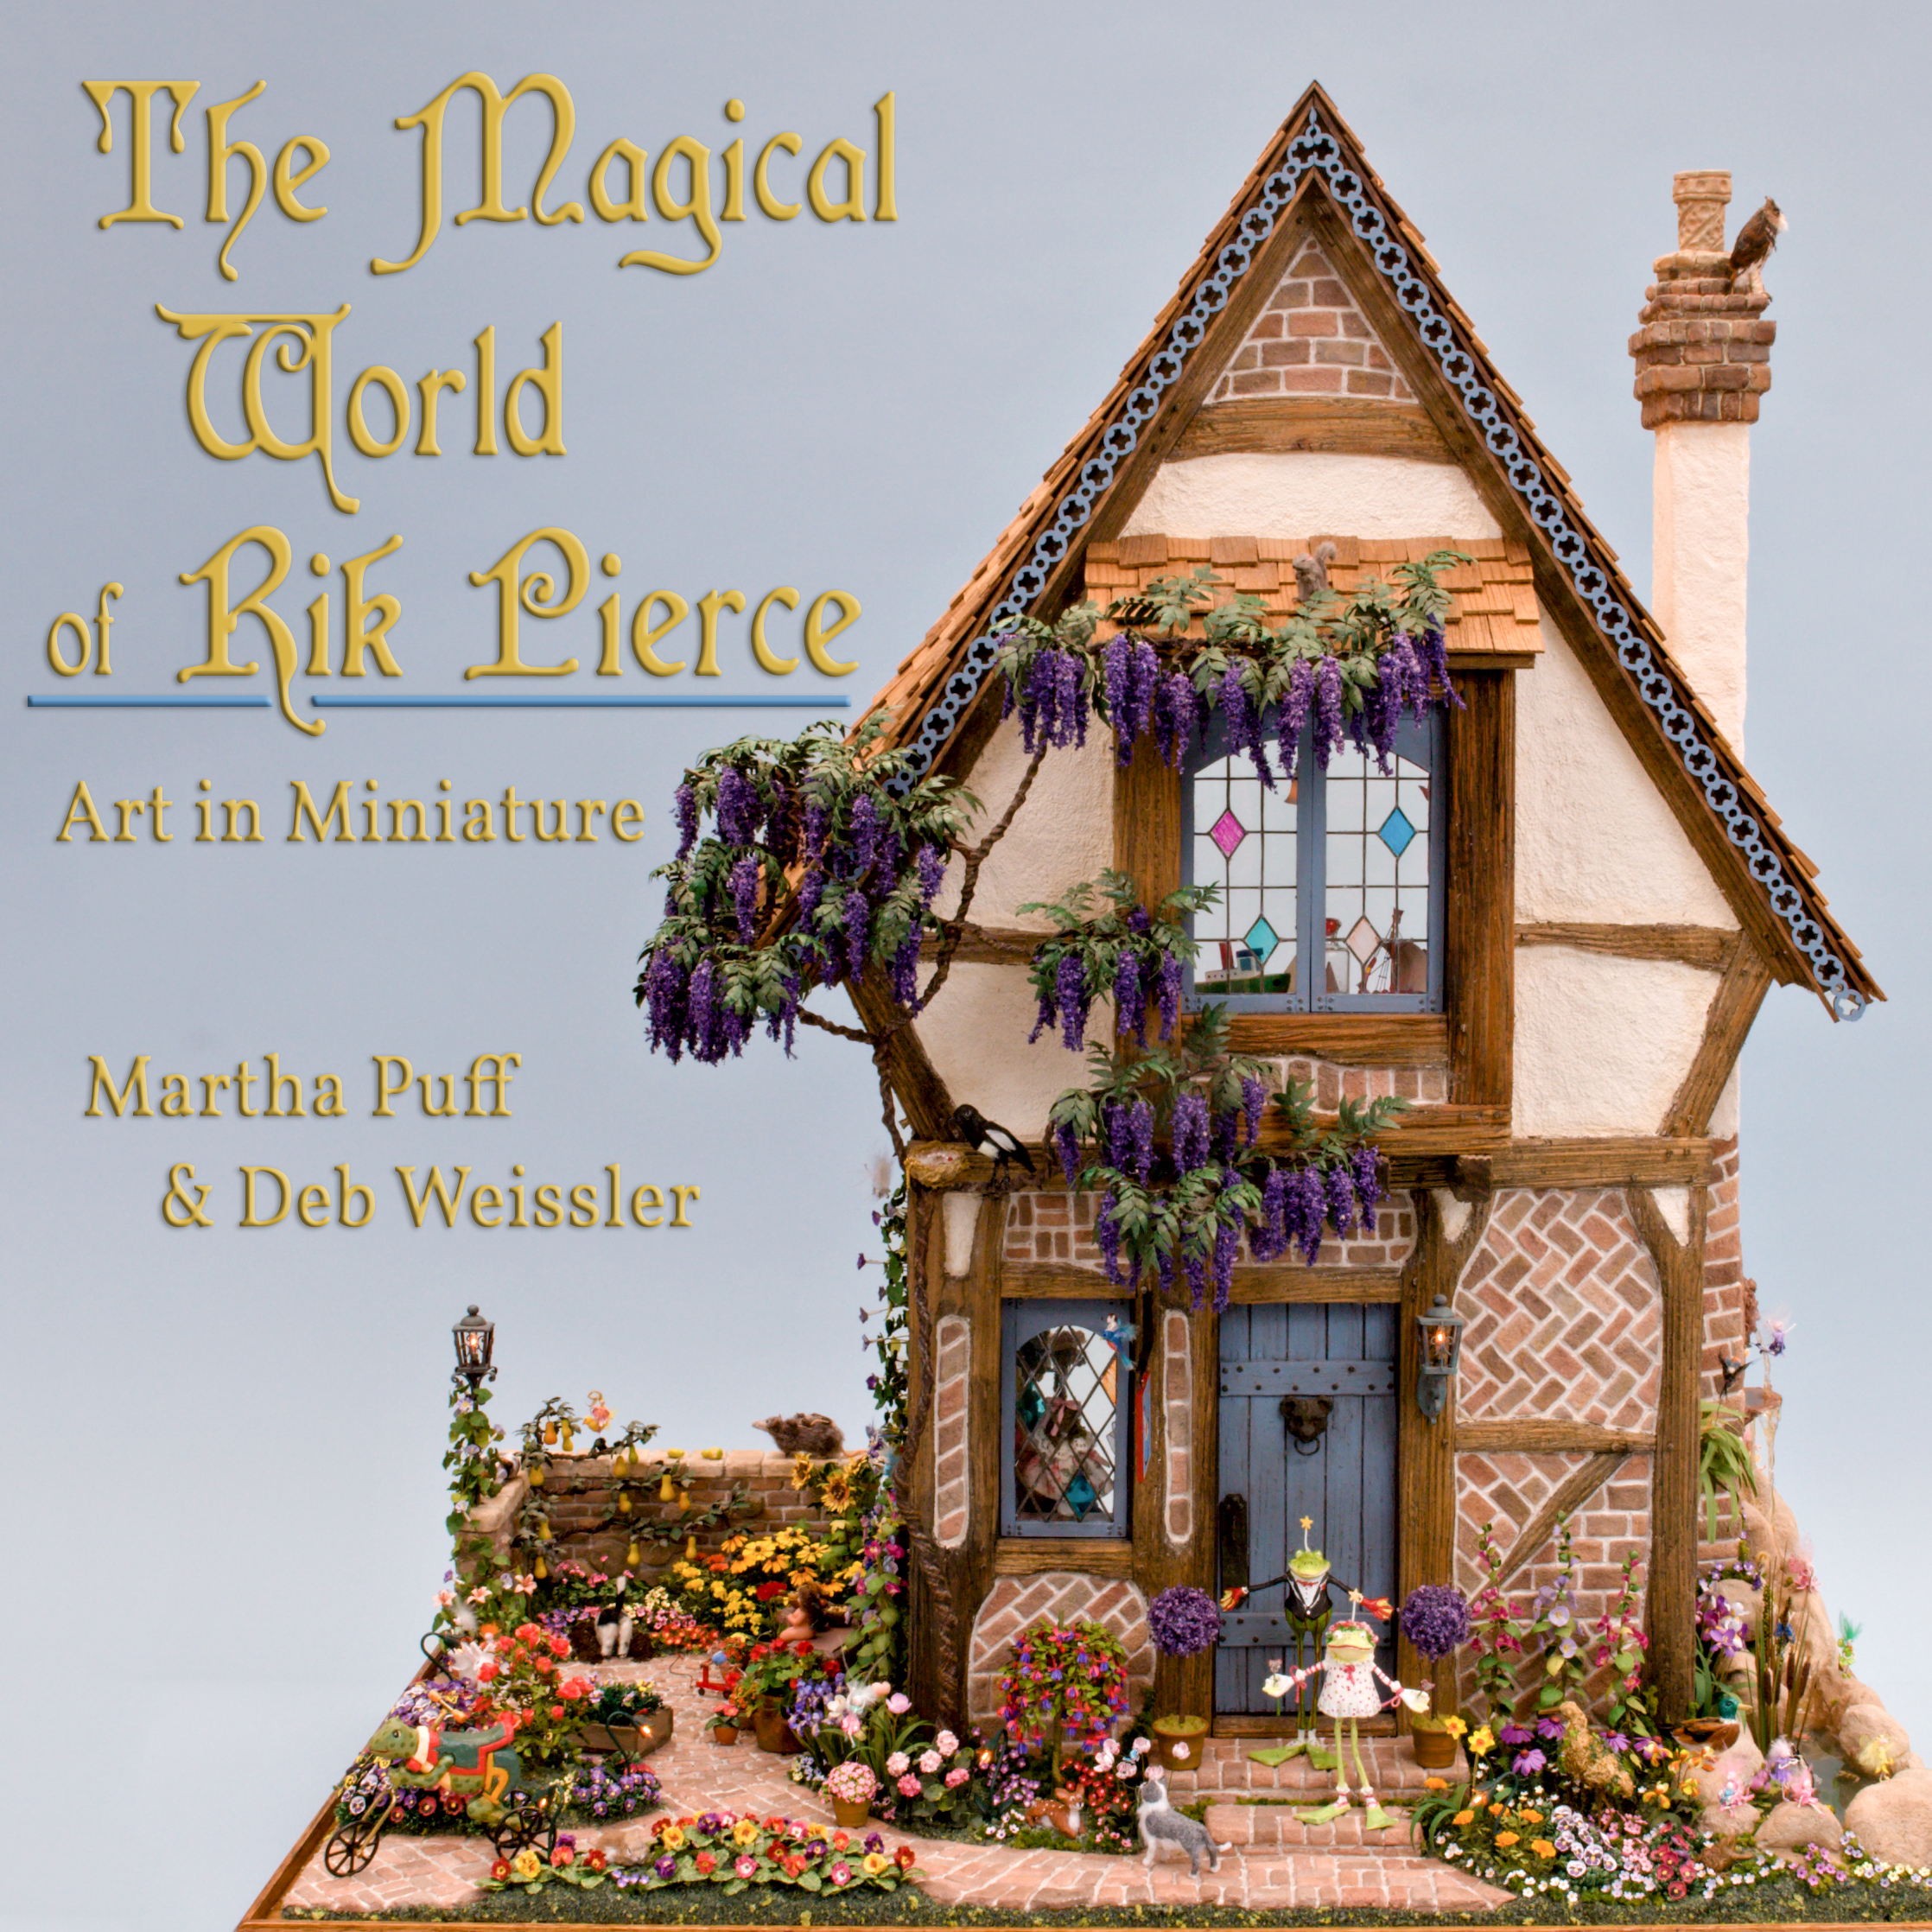 Magical World of Rik Pierce